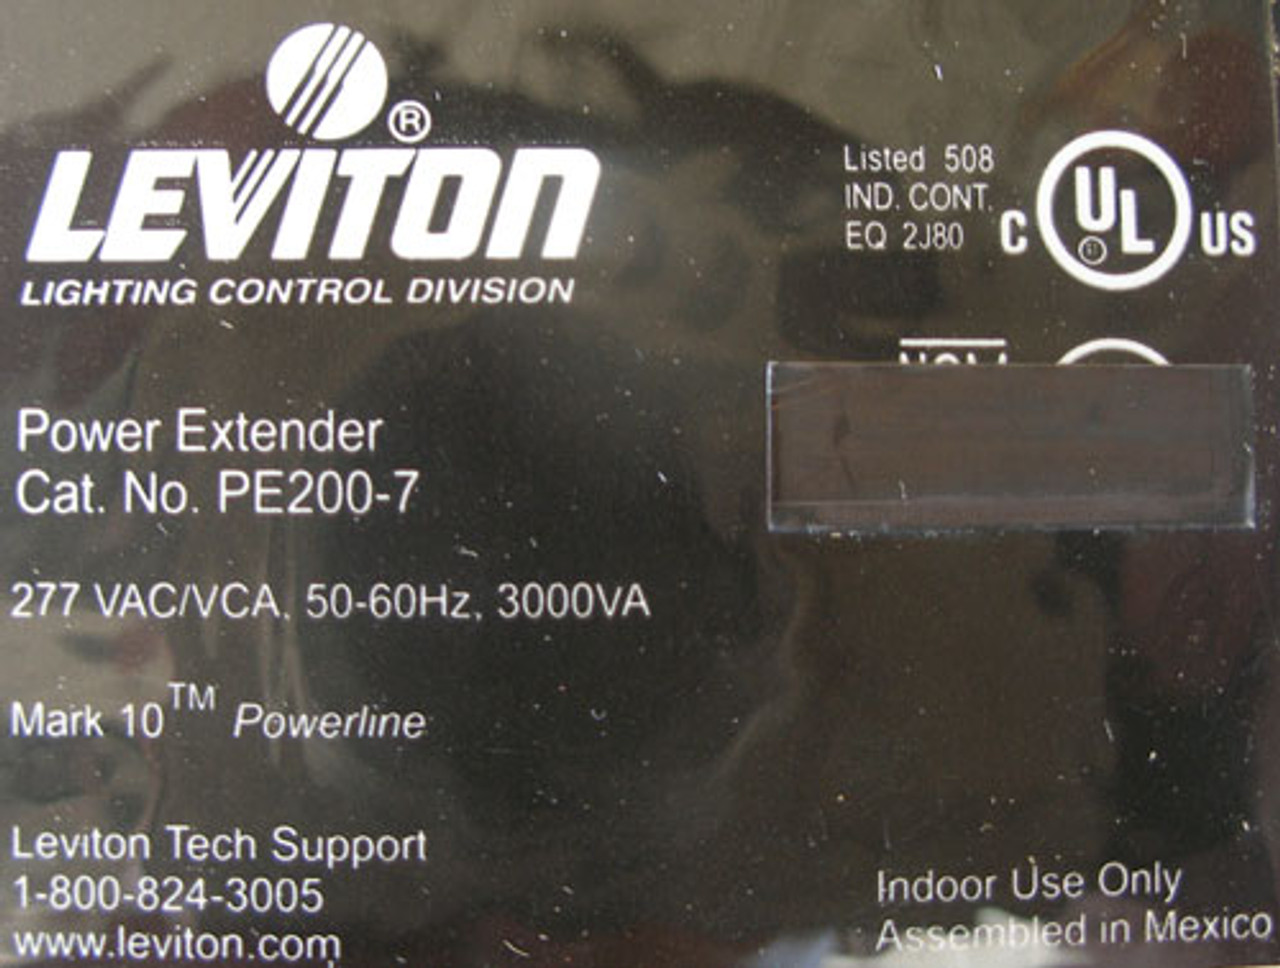 Leviton PE200-70W 277VAC 50/60Hz 3000VA Power Extender V1.0